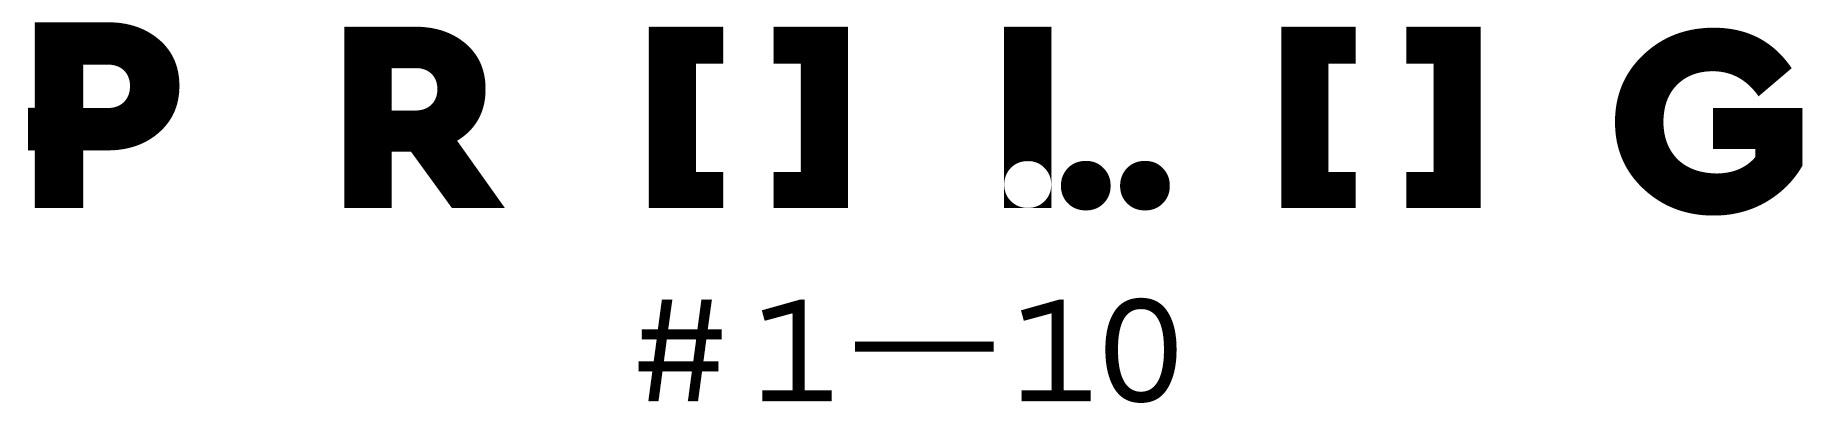 180119_RZ_Prolog-Logo+#1-10_RGB.jpg